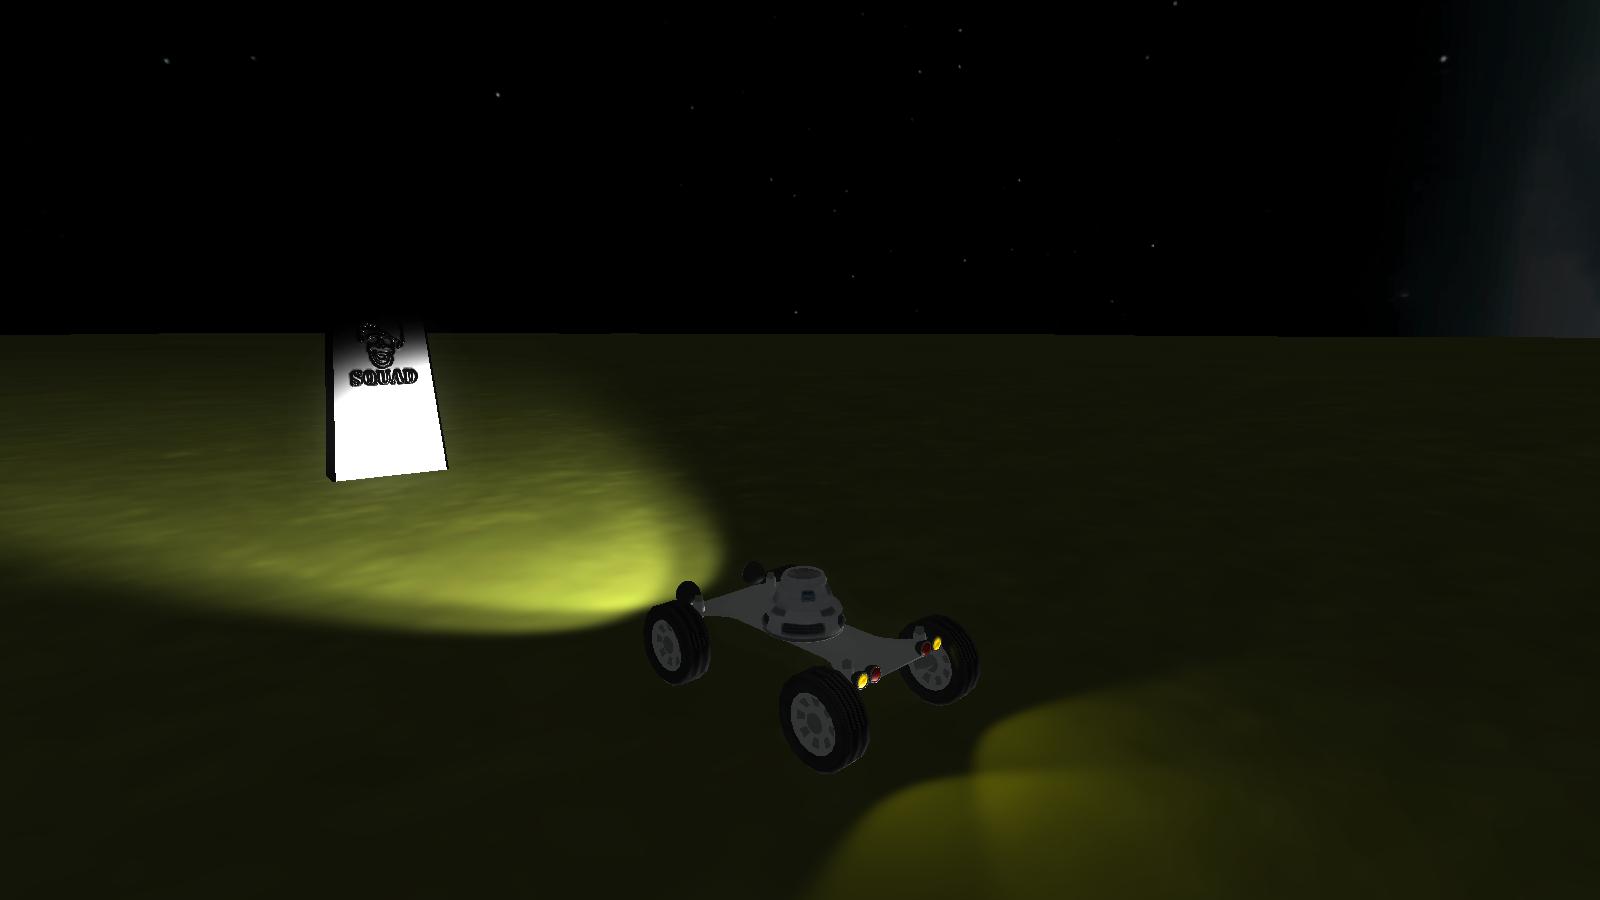 kerbal space program monolith floating - photo #18